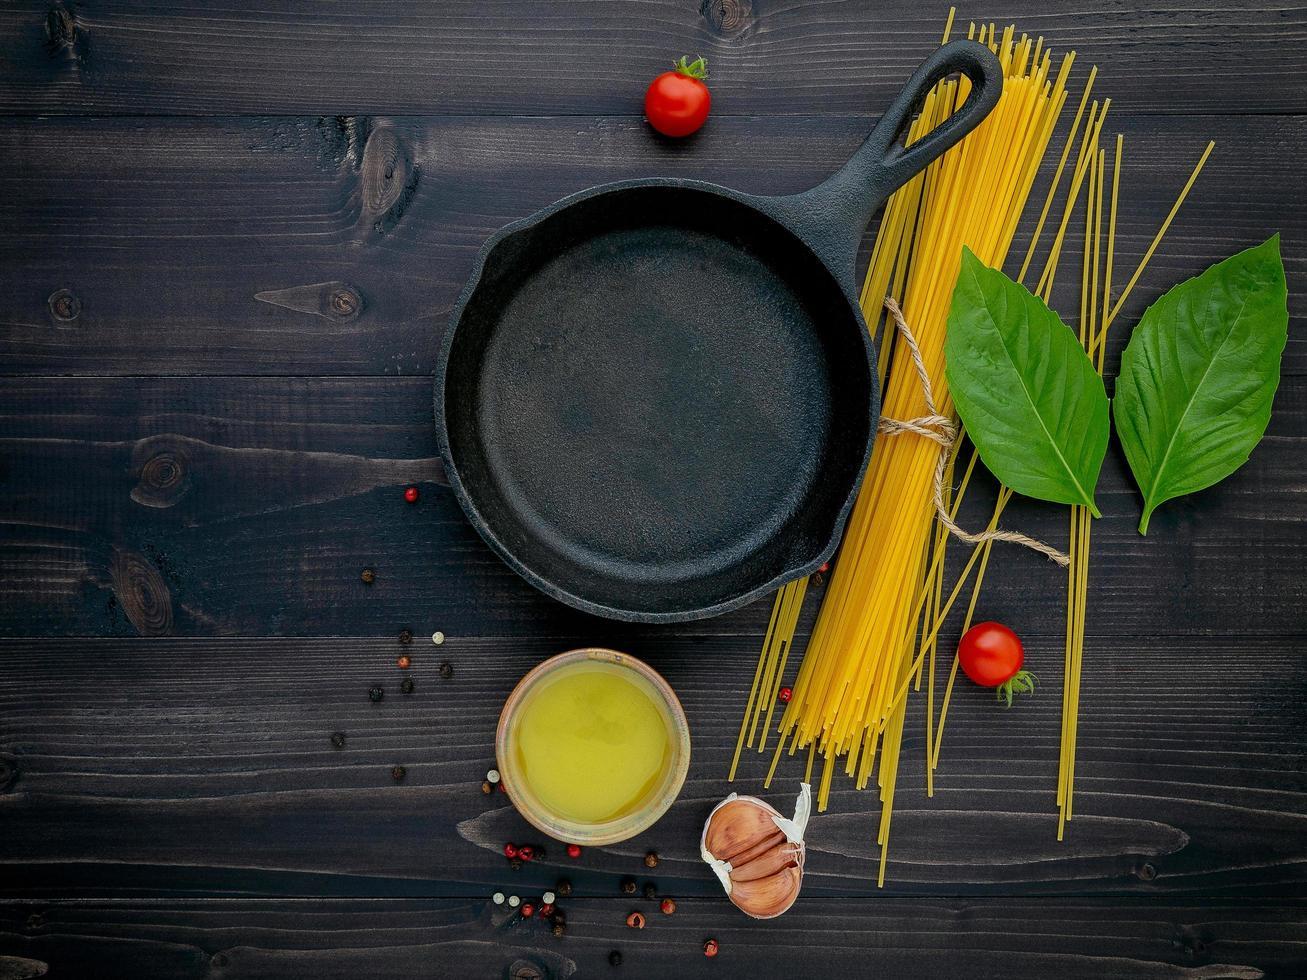 koekenpan en spaghetti ingrediënten foto